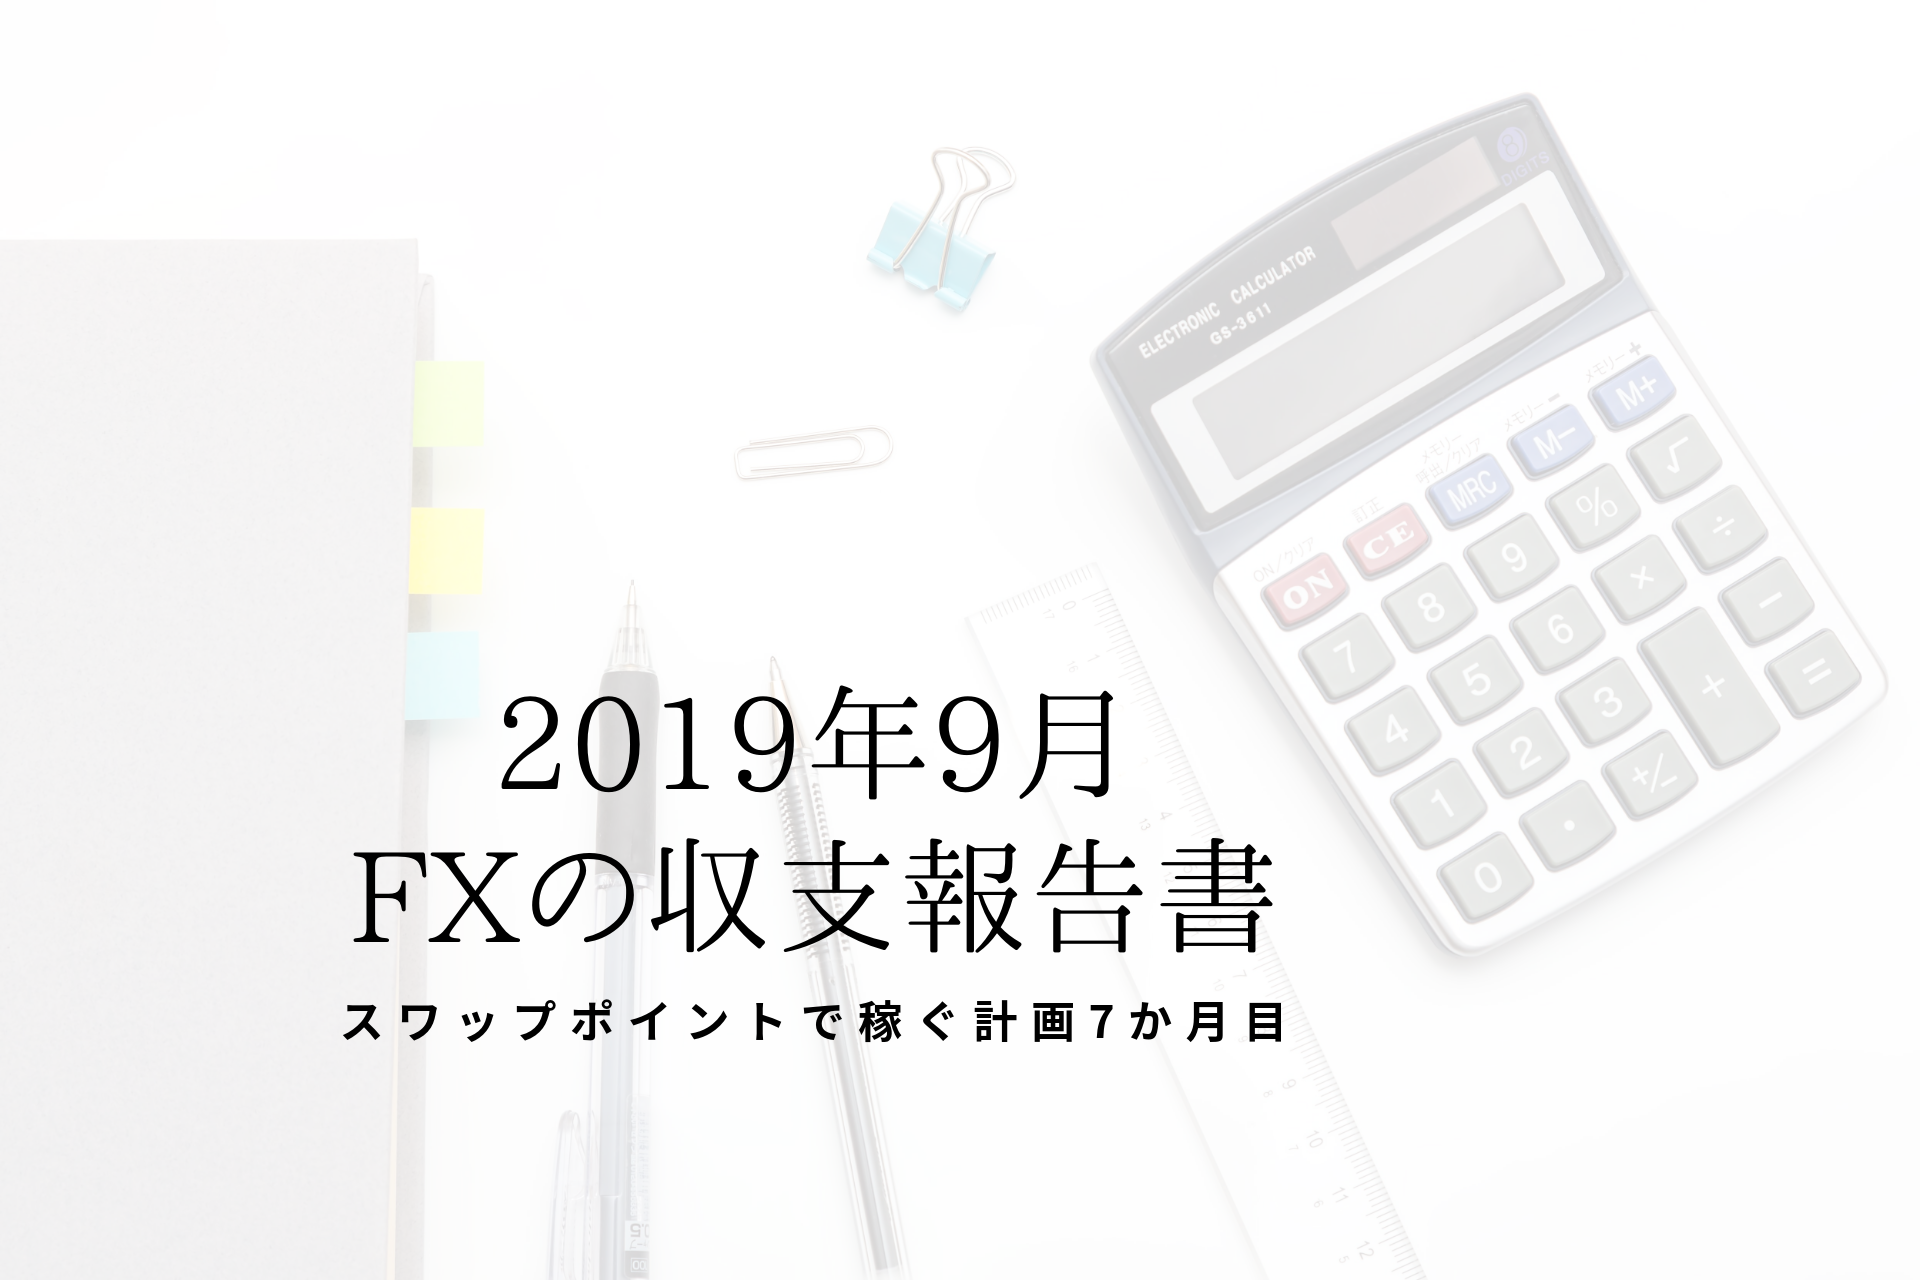 FXスワップ 2019年9月収支報告書